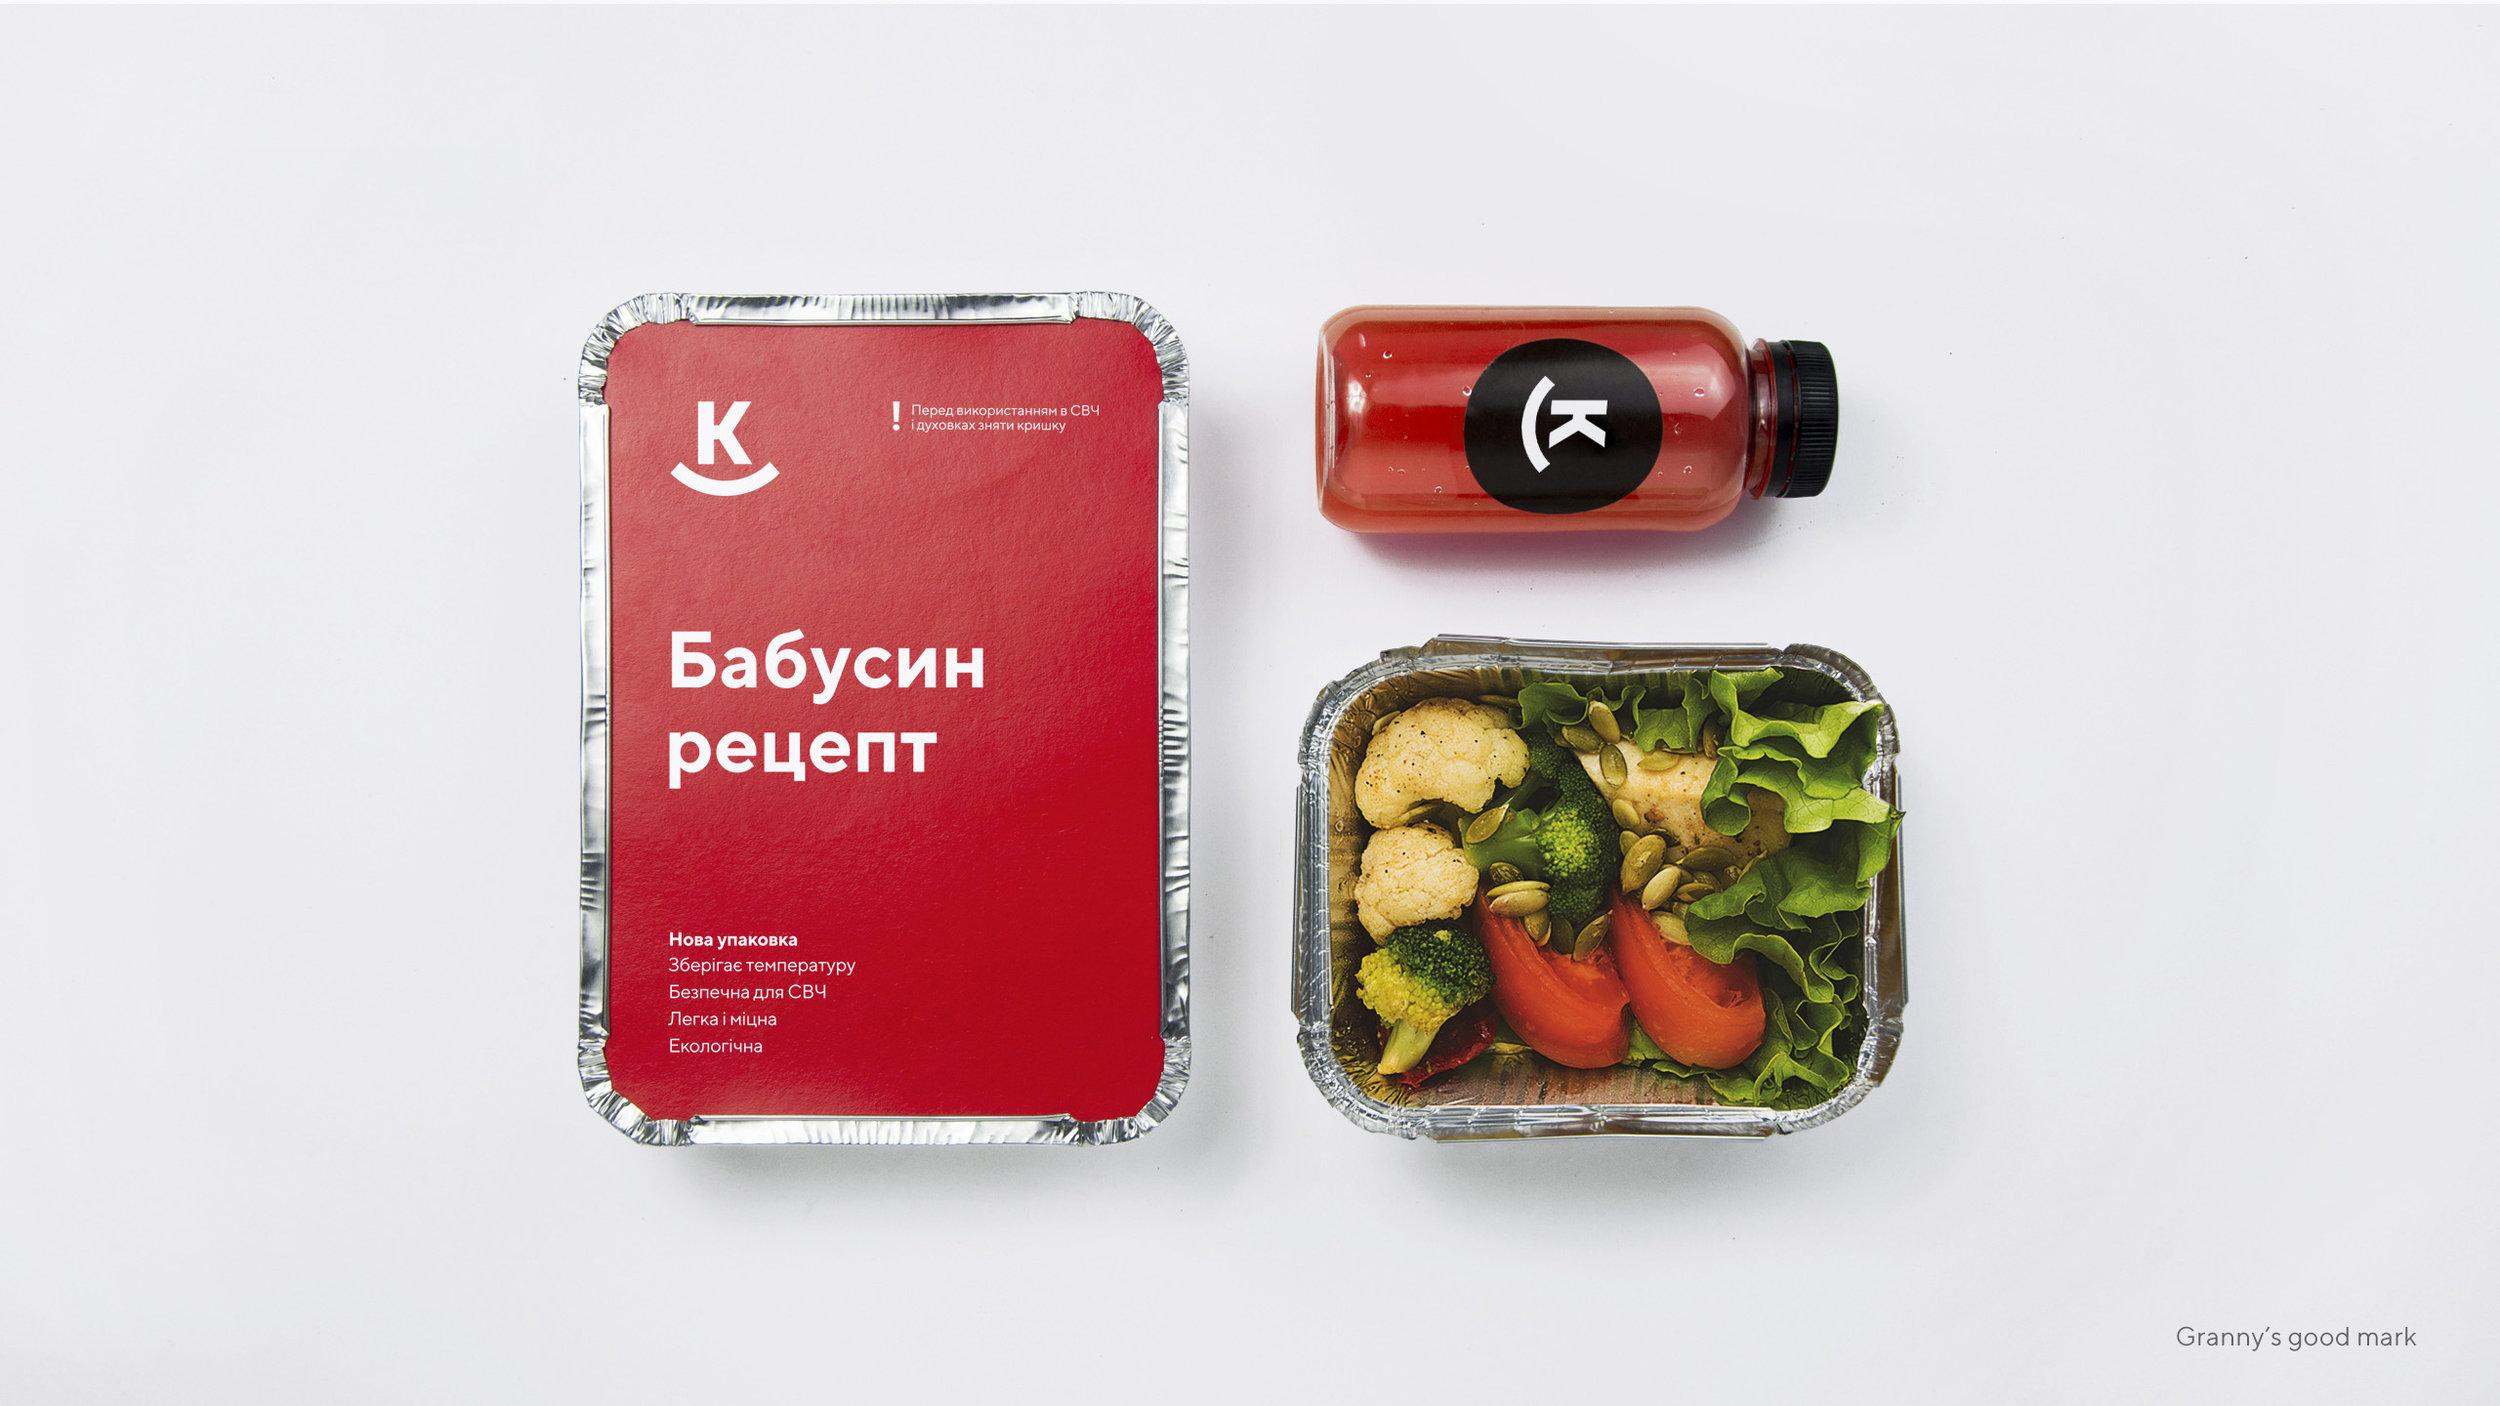 Rebranding and New Communication of the Supermarket Chain Klass